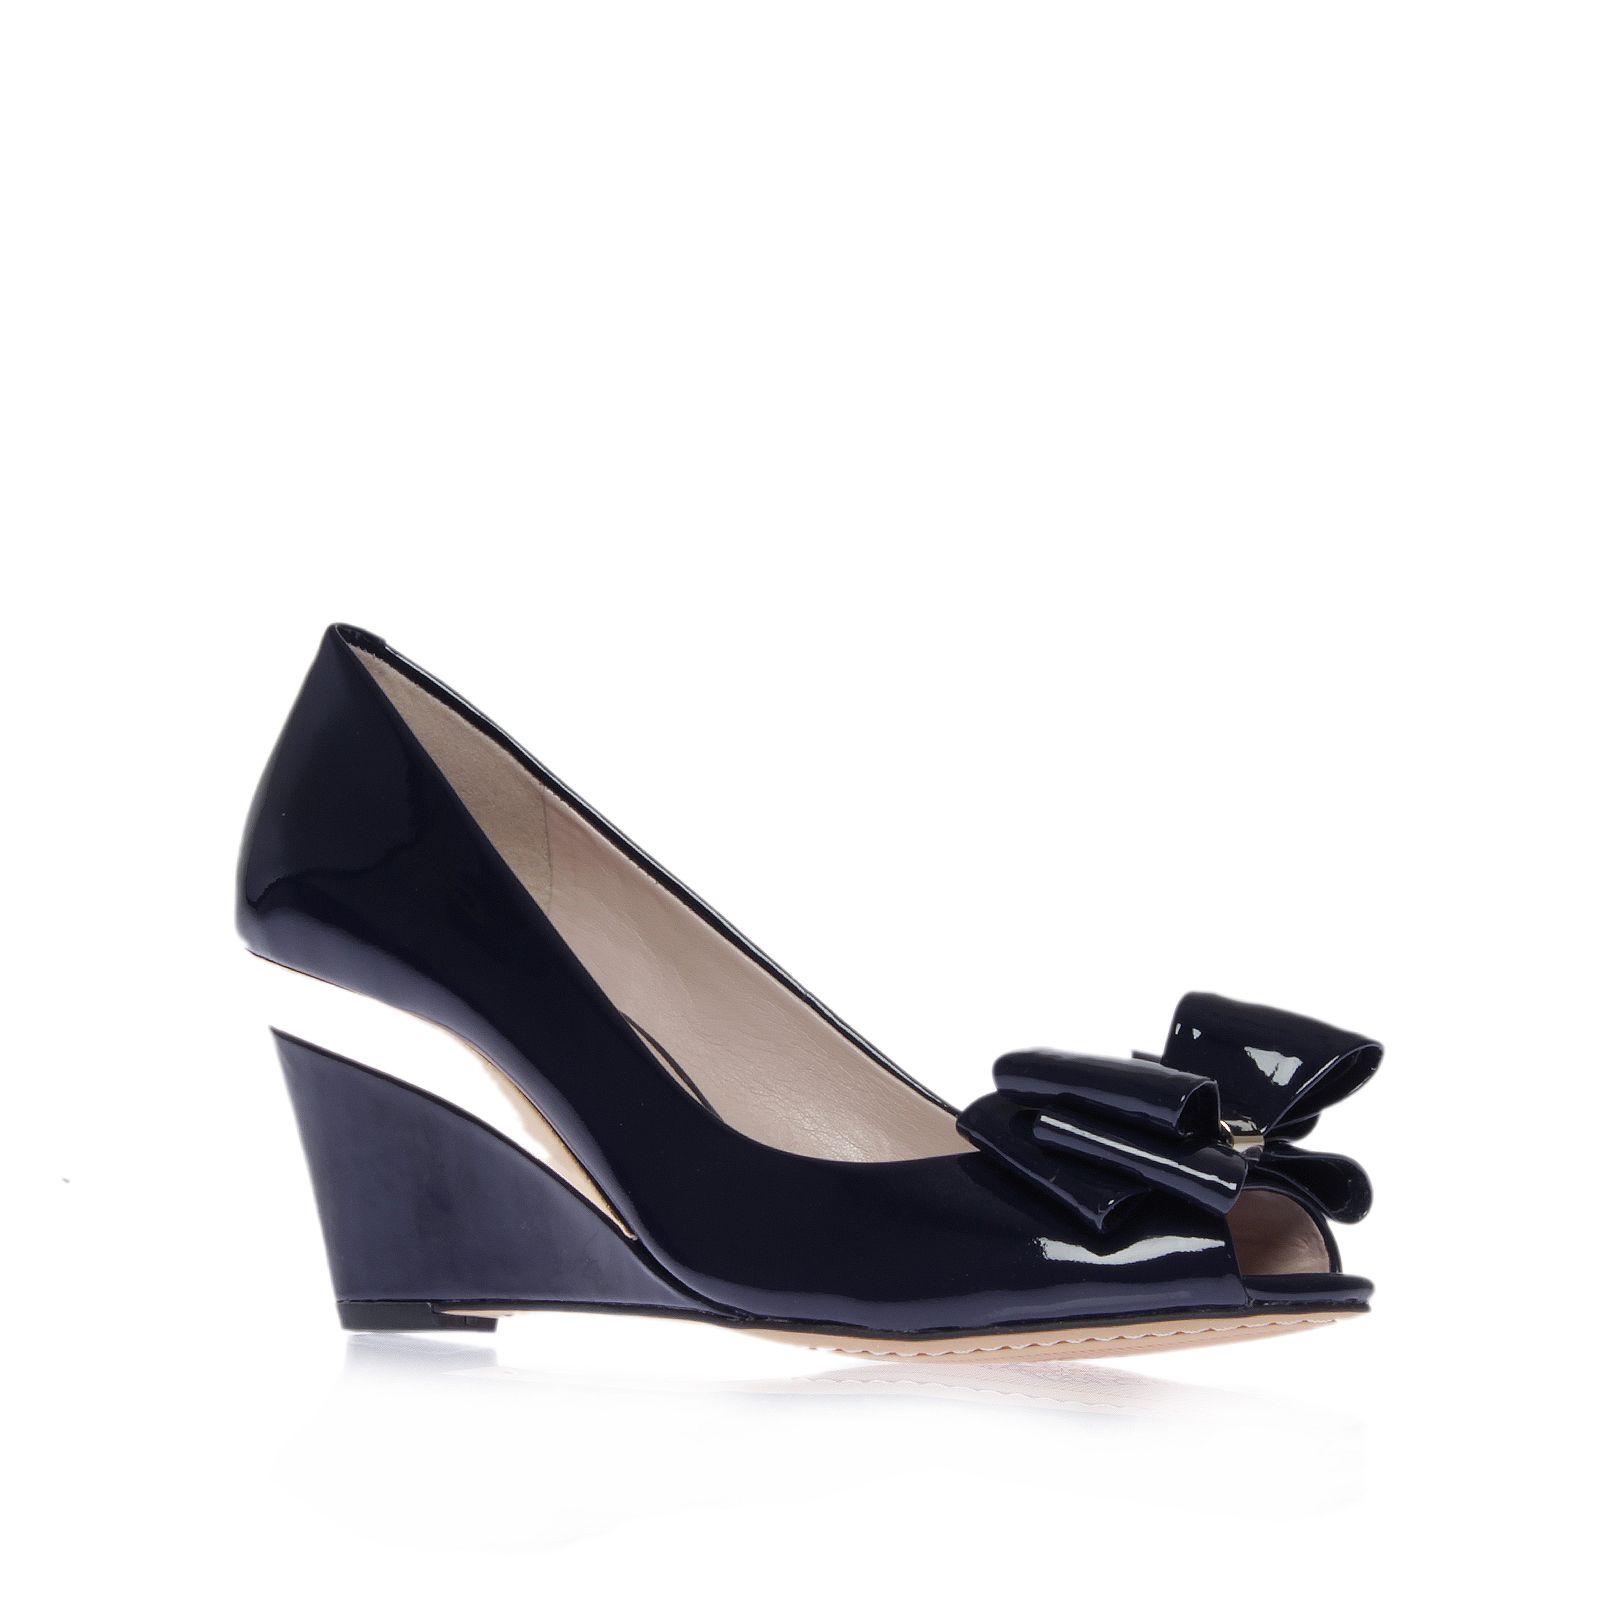 Vince Camuto Shoe Sizing